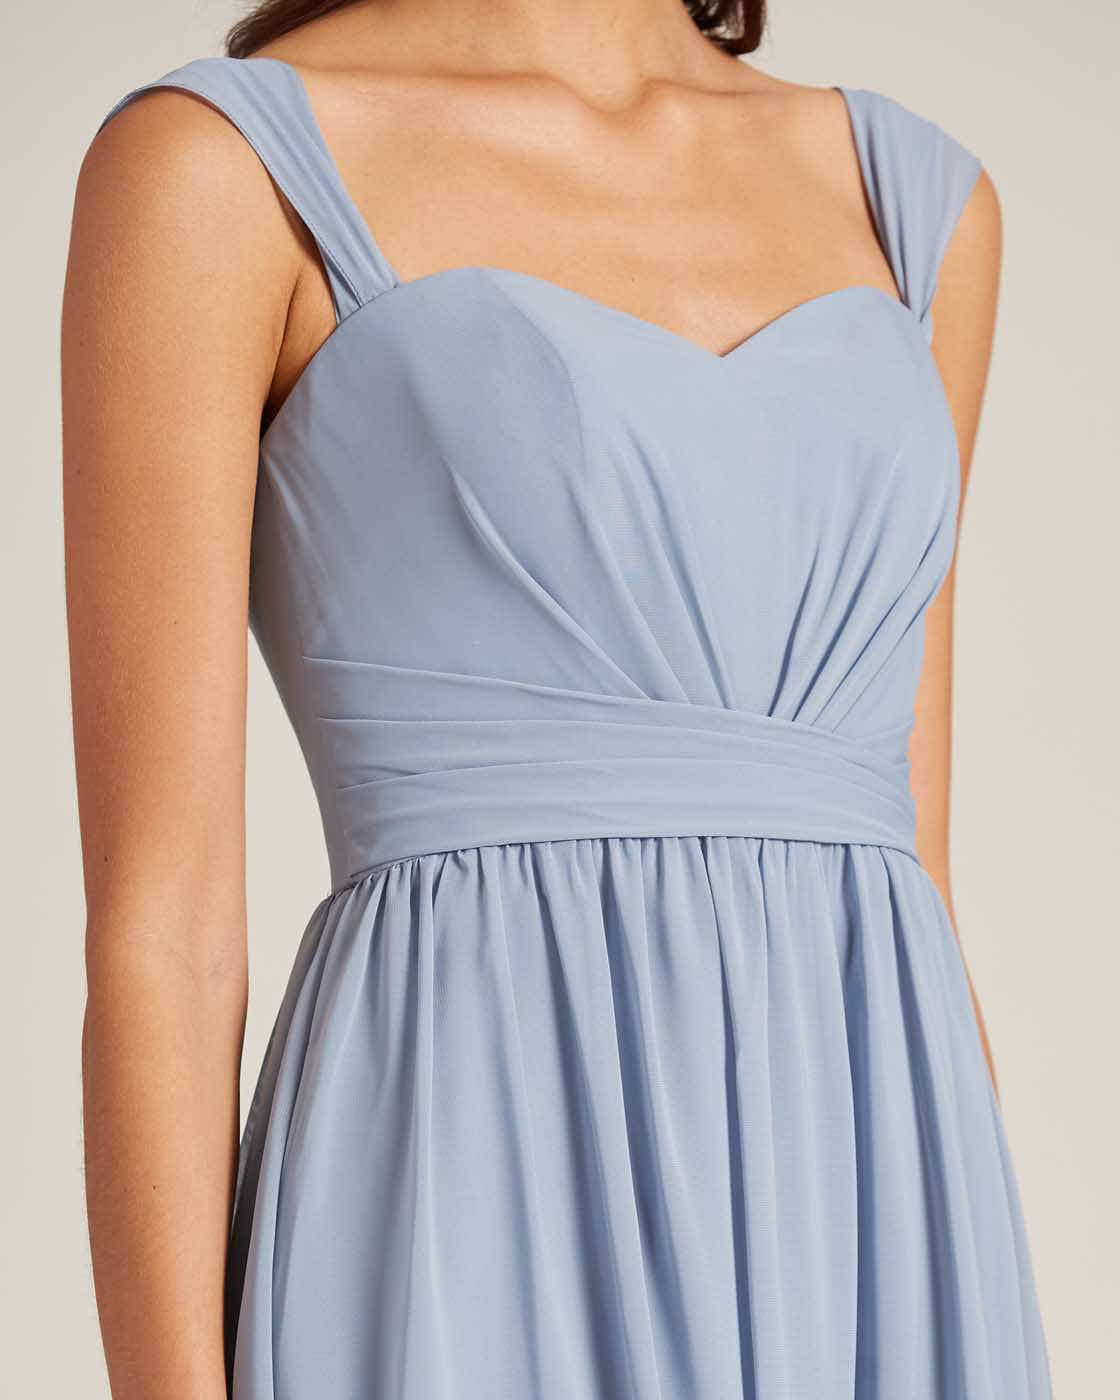 Blue Thick Strap Sweetheart Neckline Dress - Detail